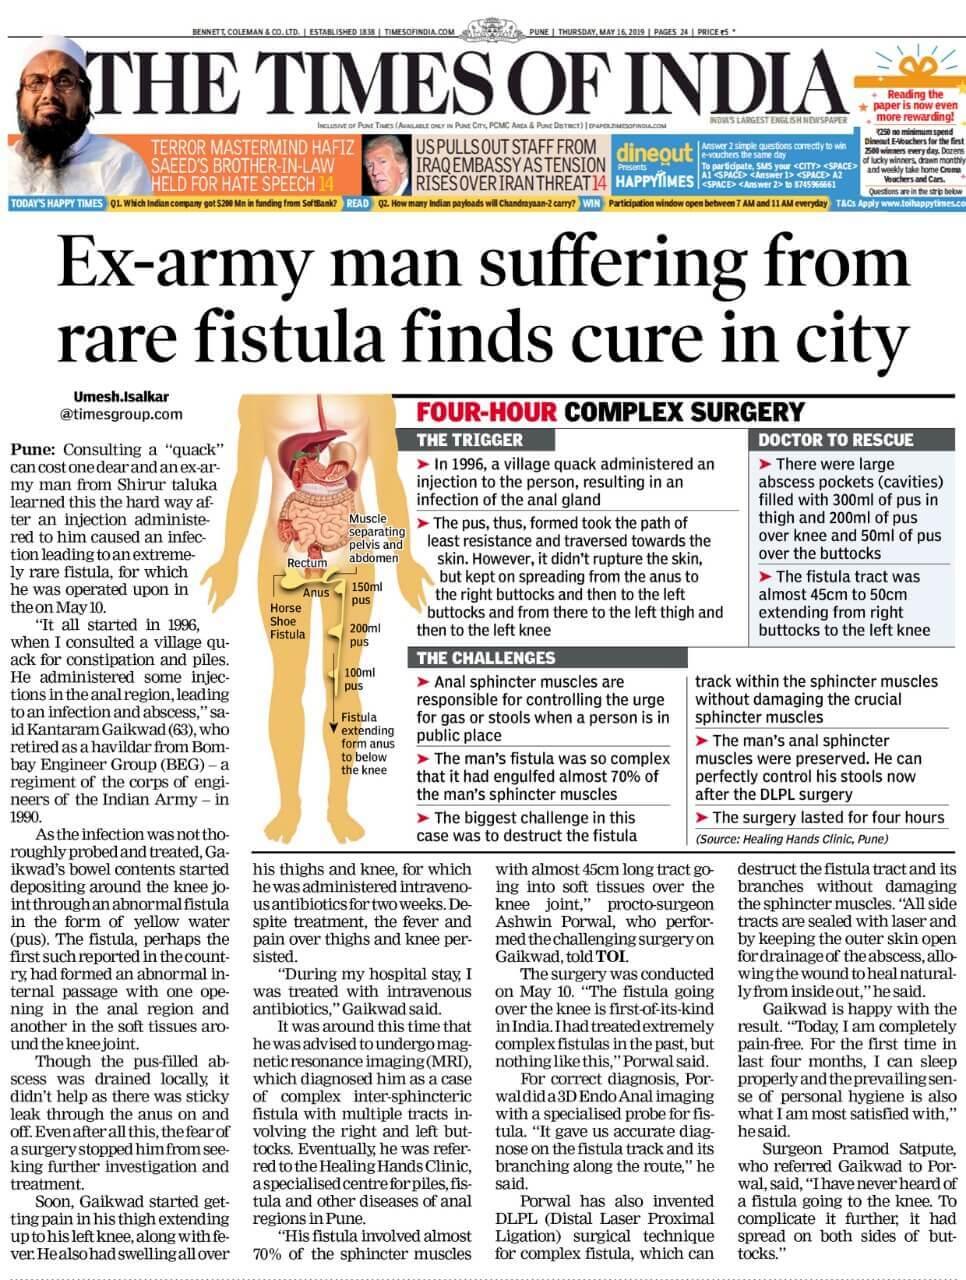 Fistula Patient Gaikwad